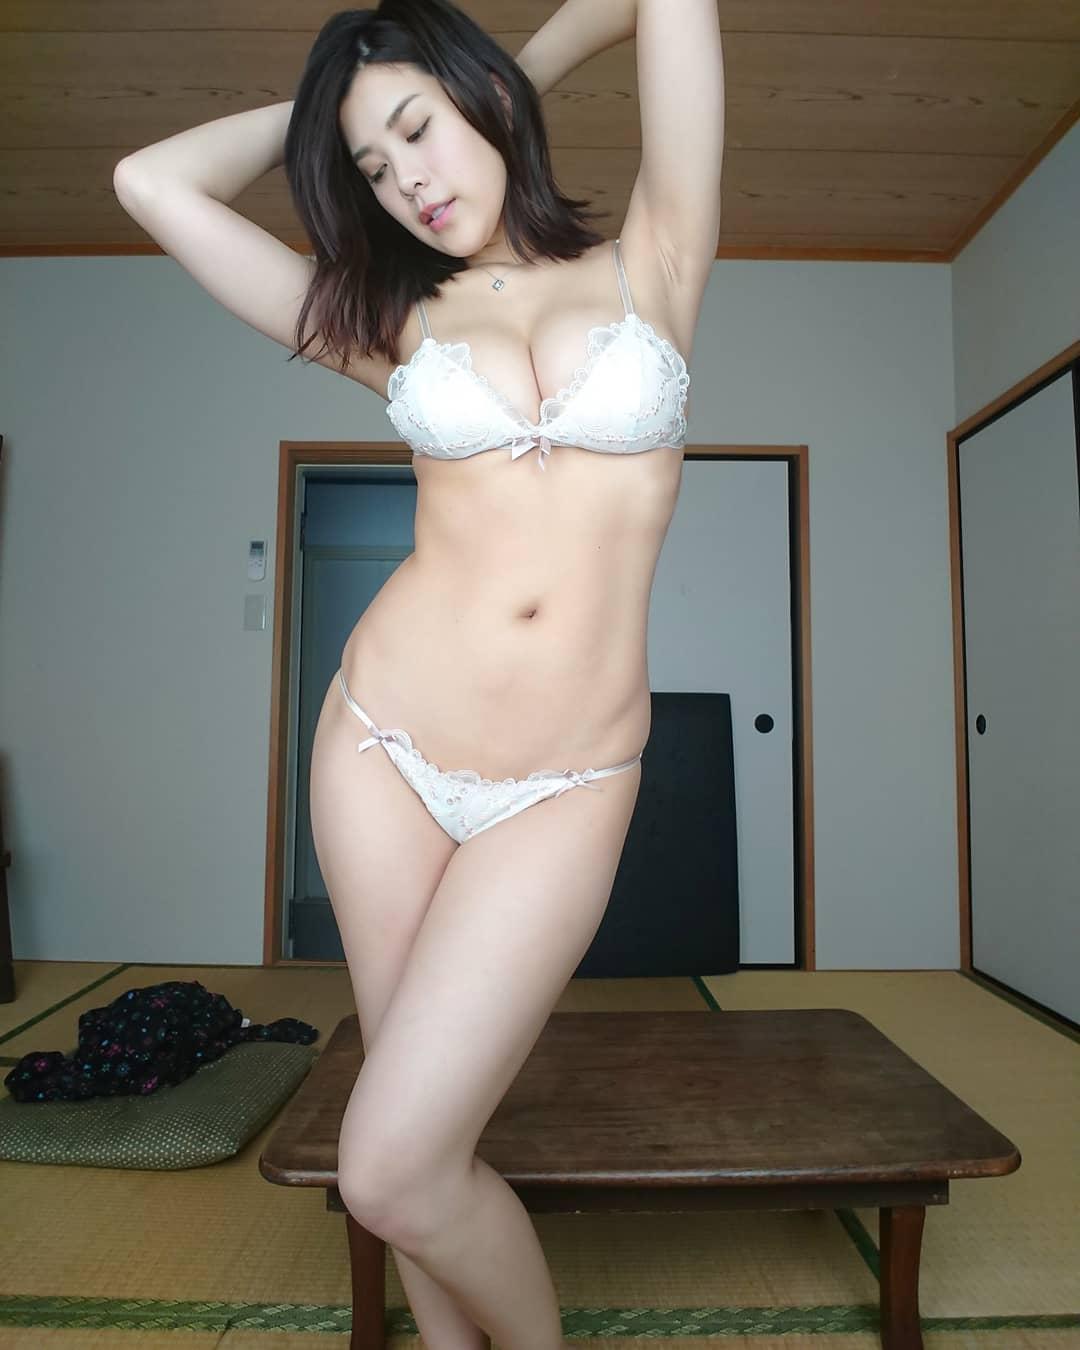 pW22zDrk o - IG正妹—内田 瑞穂 Mizuho Uchida